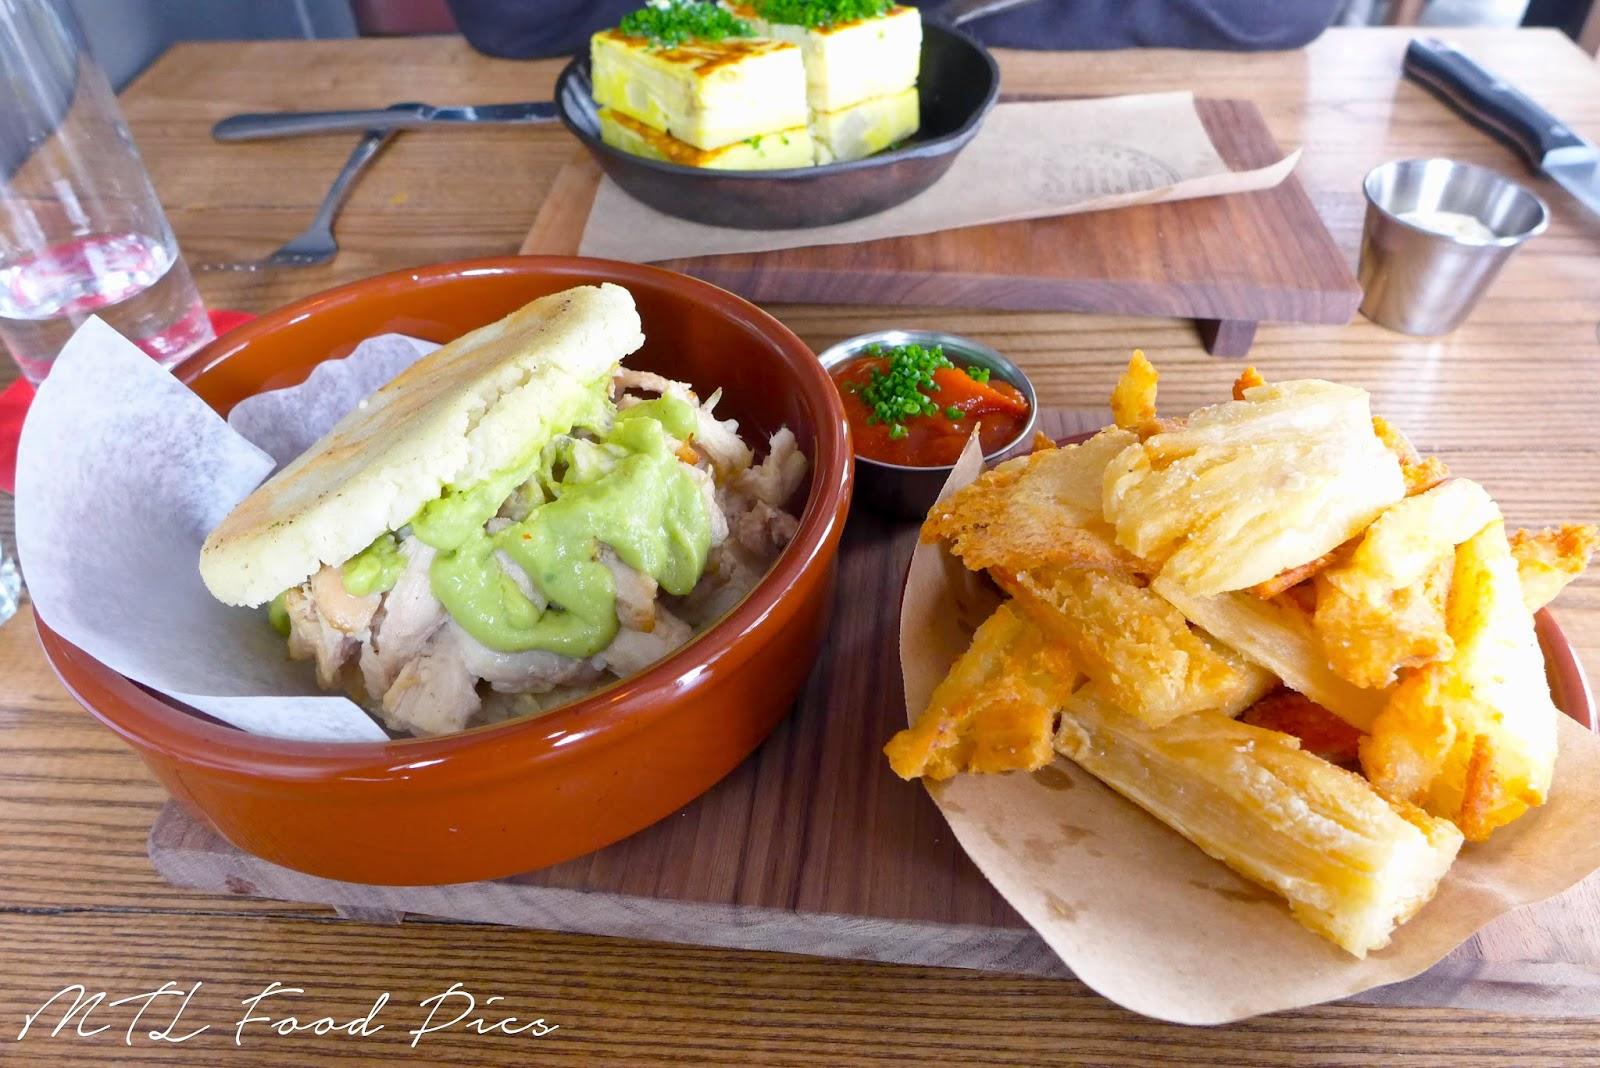 chicken avocado arepas with yuca fries - venezuelan cuisine